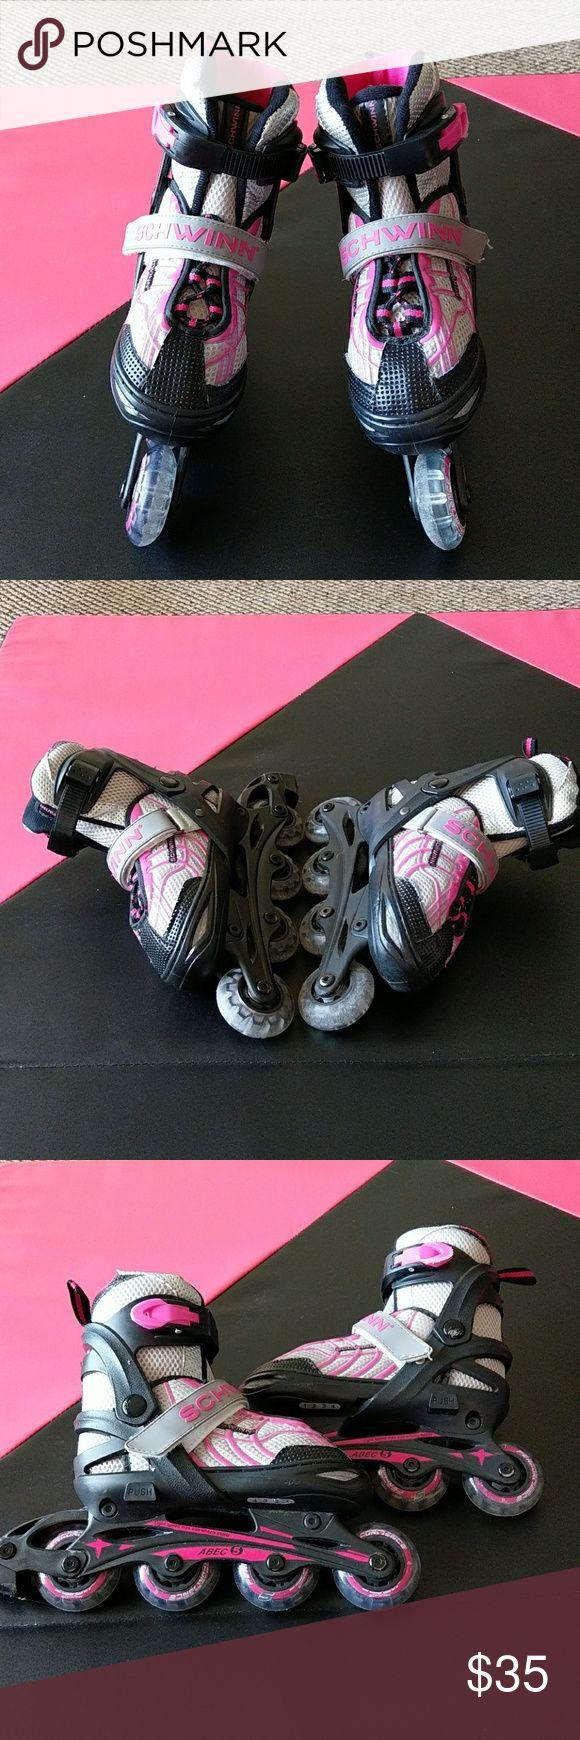 Schwinn Girls' Adjustable roller blades 1-4 Schwinn Girls' Adjustable Inline Skates/roller blades 1-4. schwinn Shoes